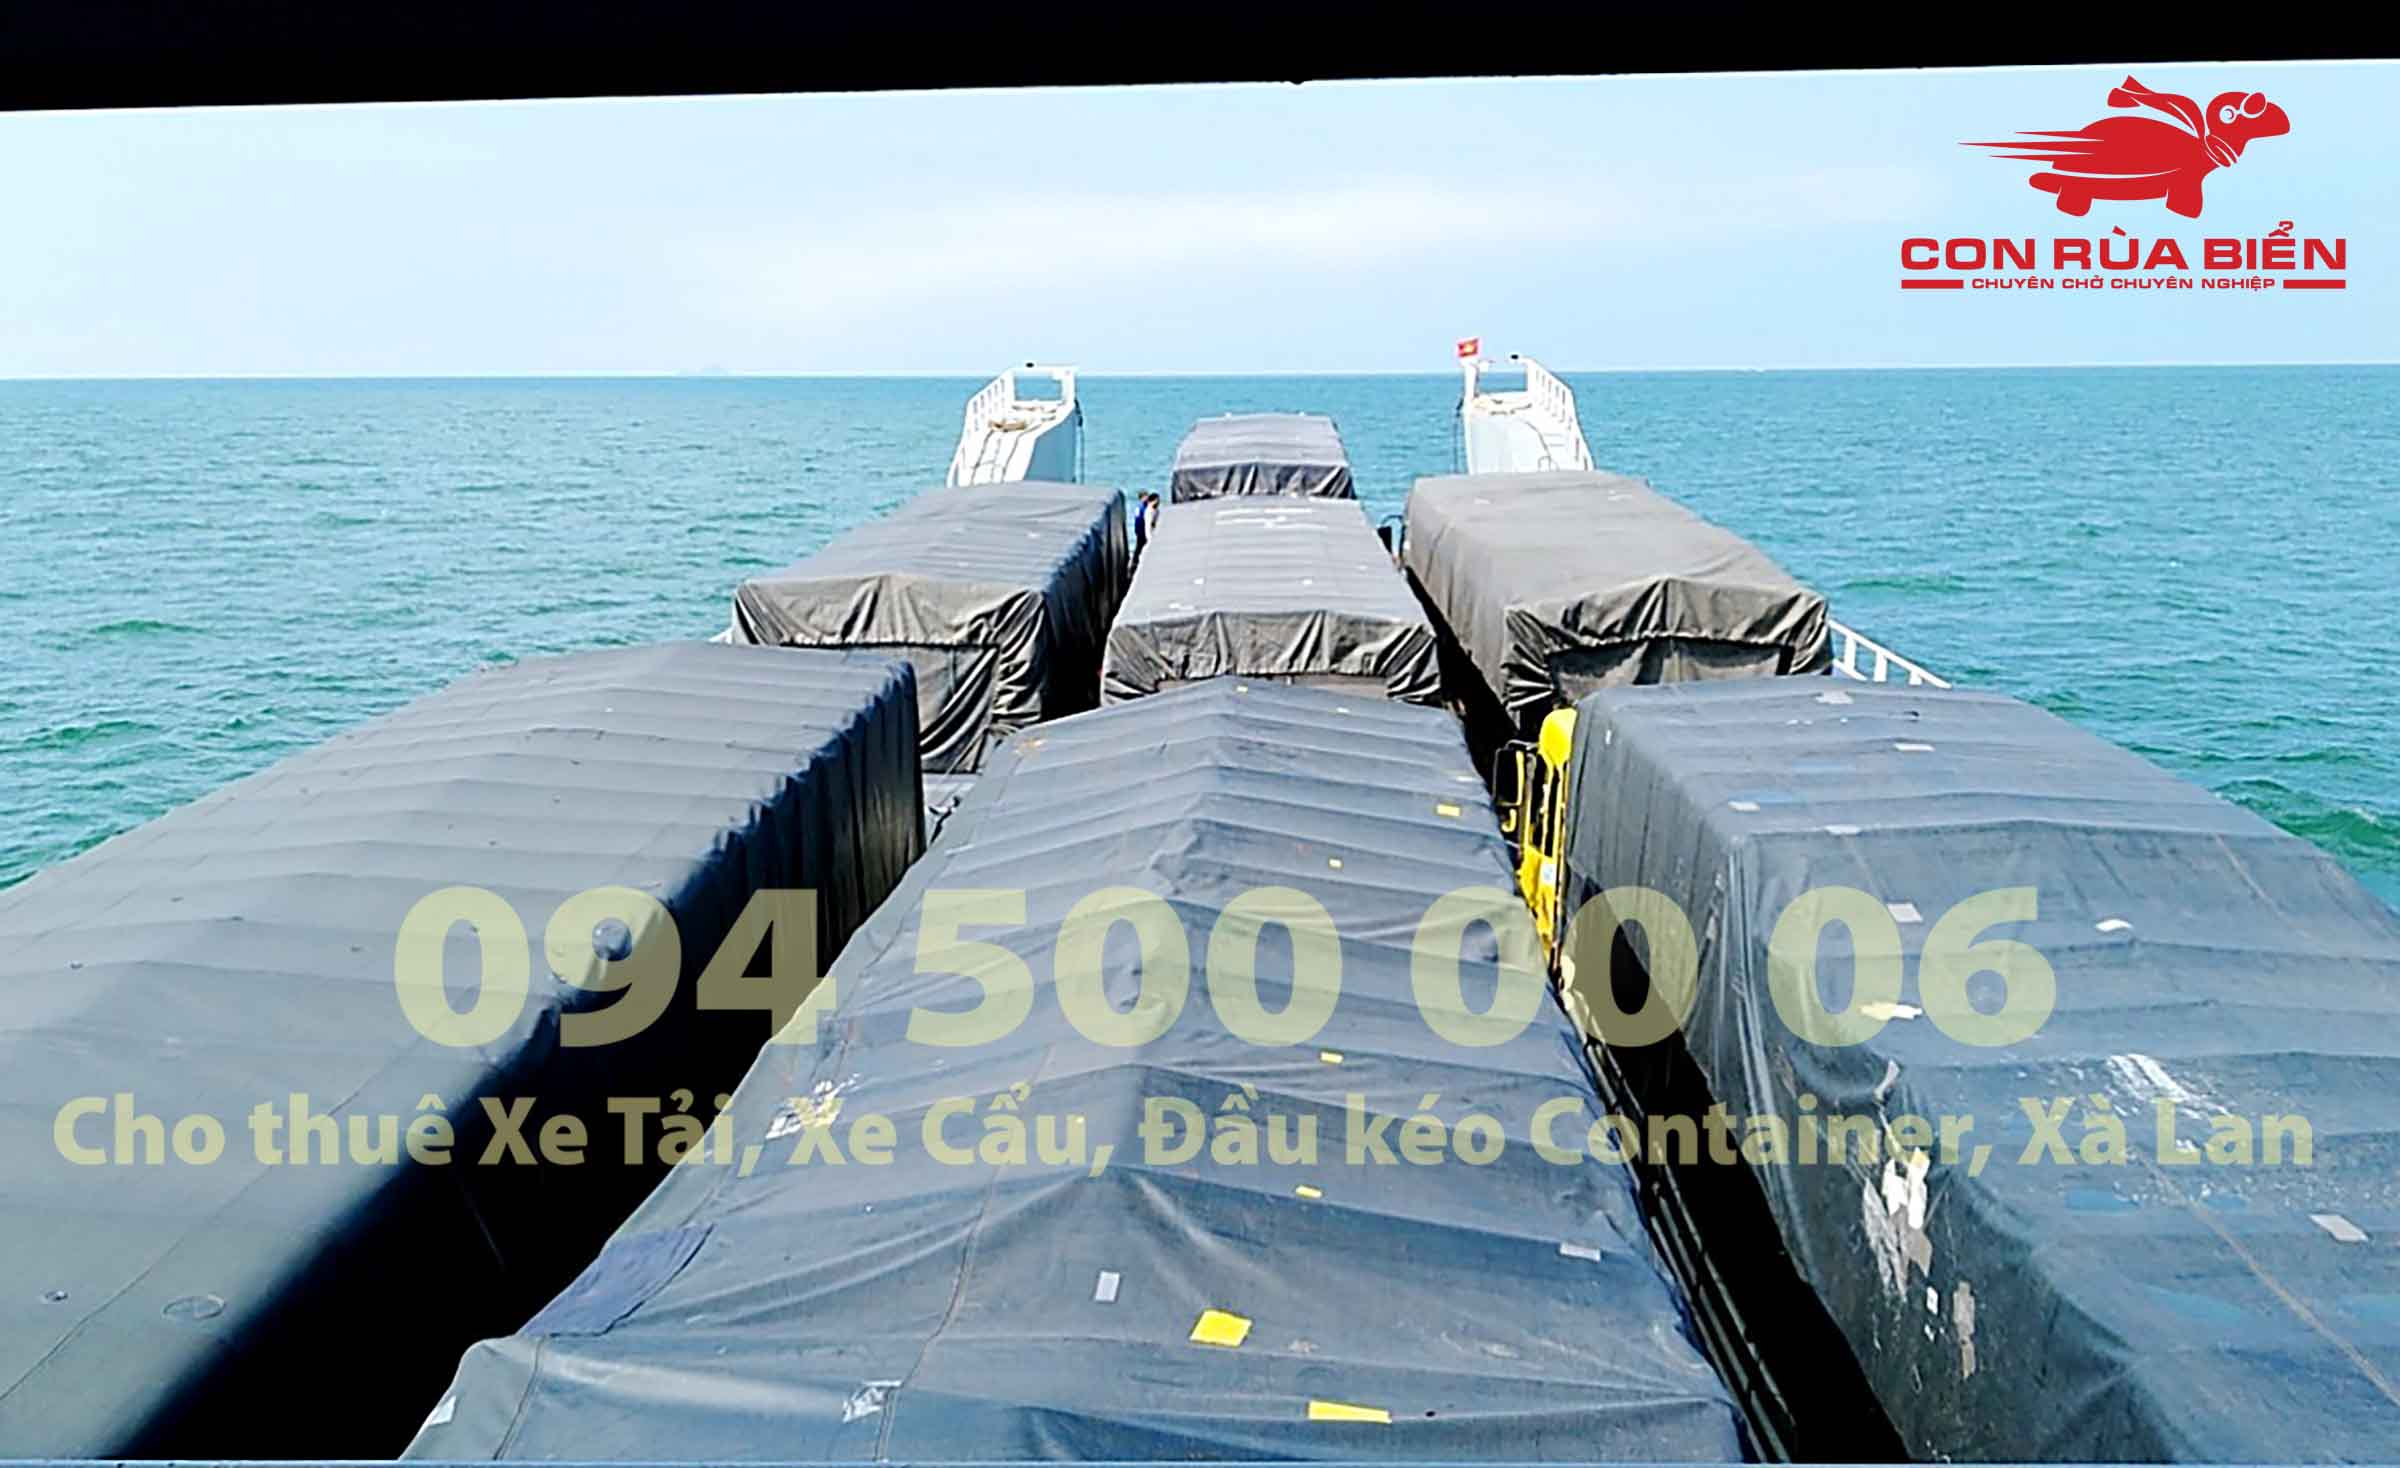 Cho thue xa lan ha mom cho xe tai cho xe dau keo container di Phu Quoc Hon Thom Nam Du 3